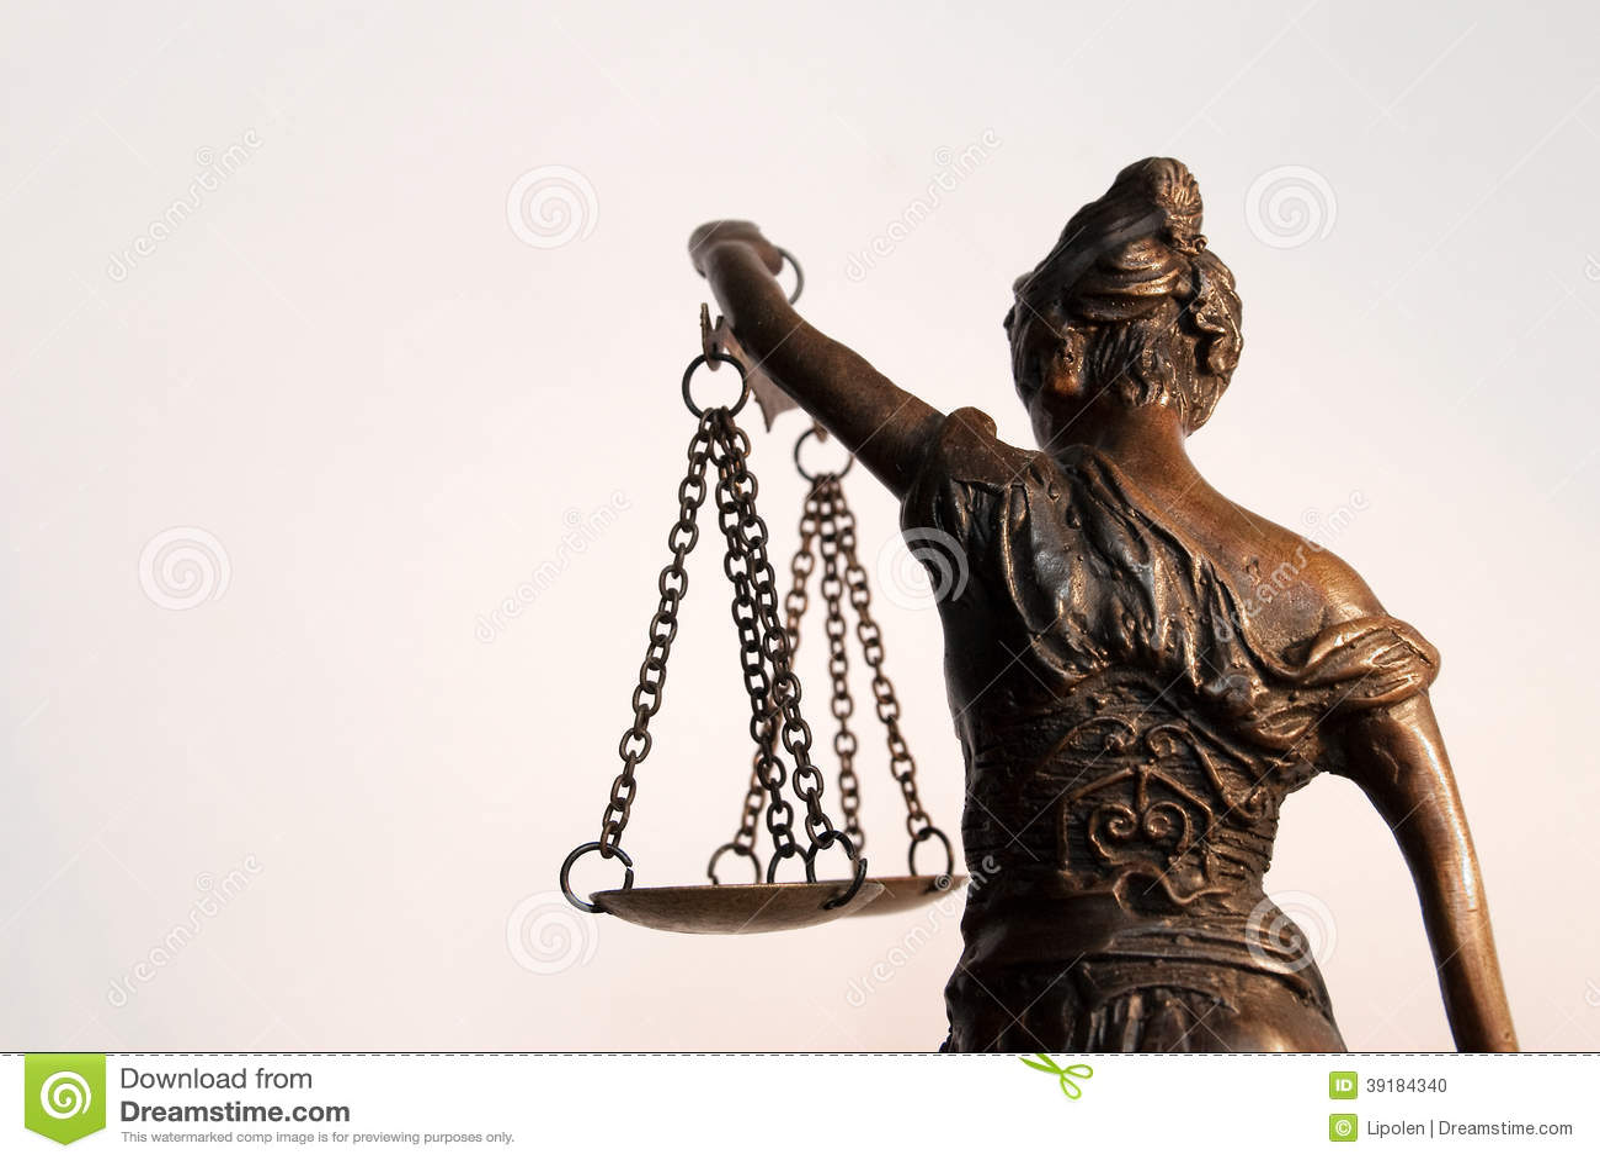 Señora Justice - Temida - Themis